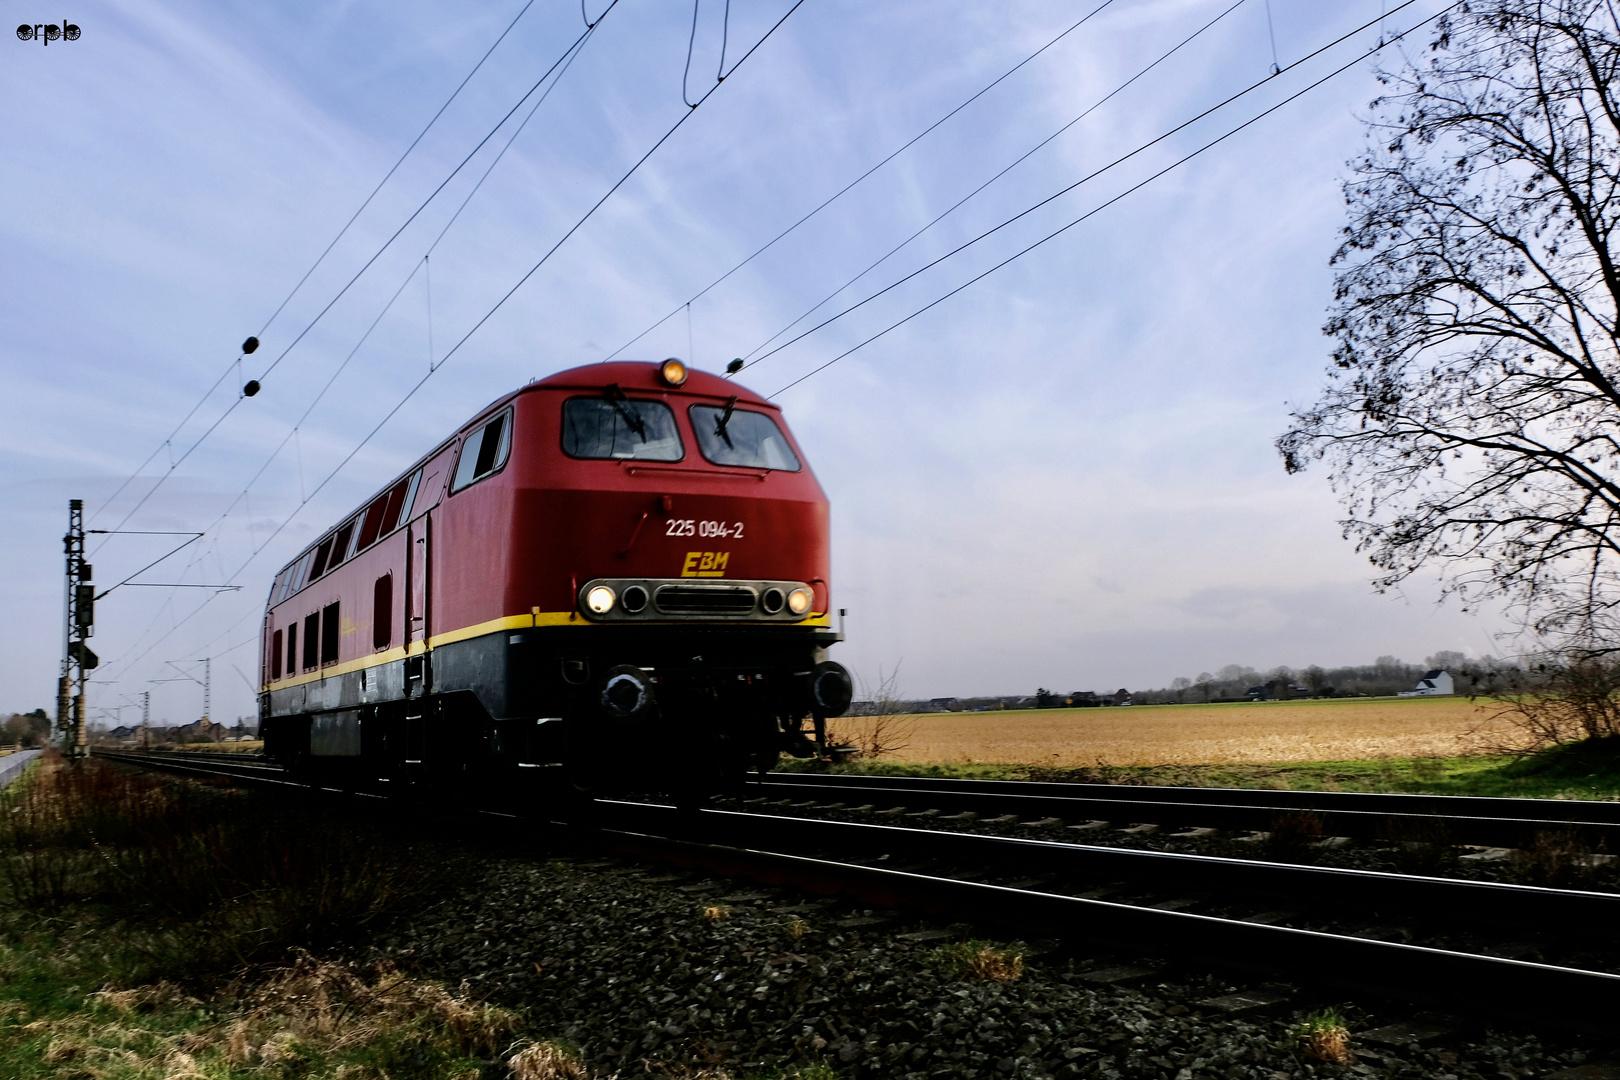 Diesellokomotive 225 094-2 EBM